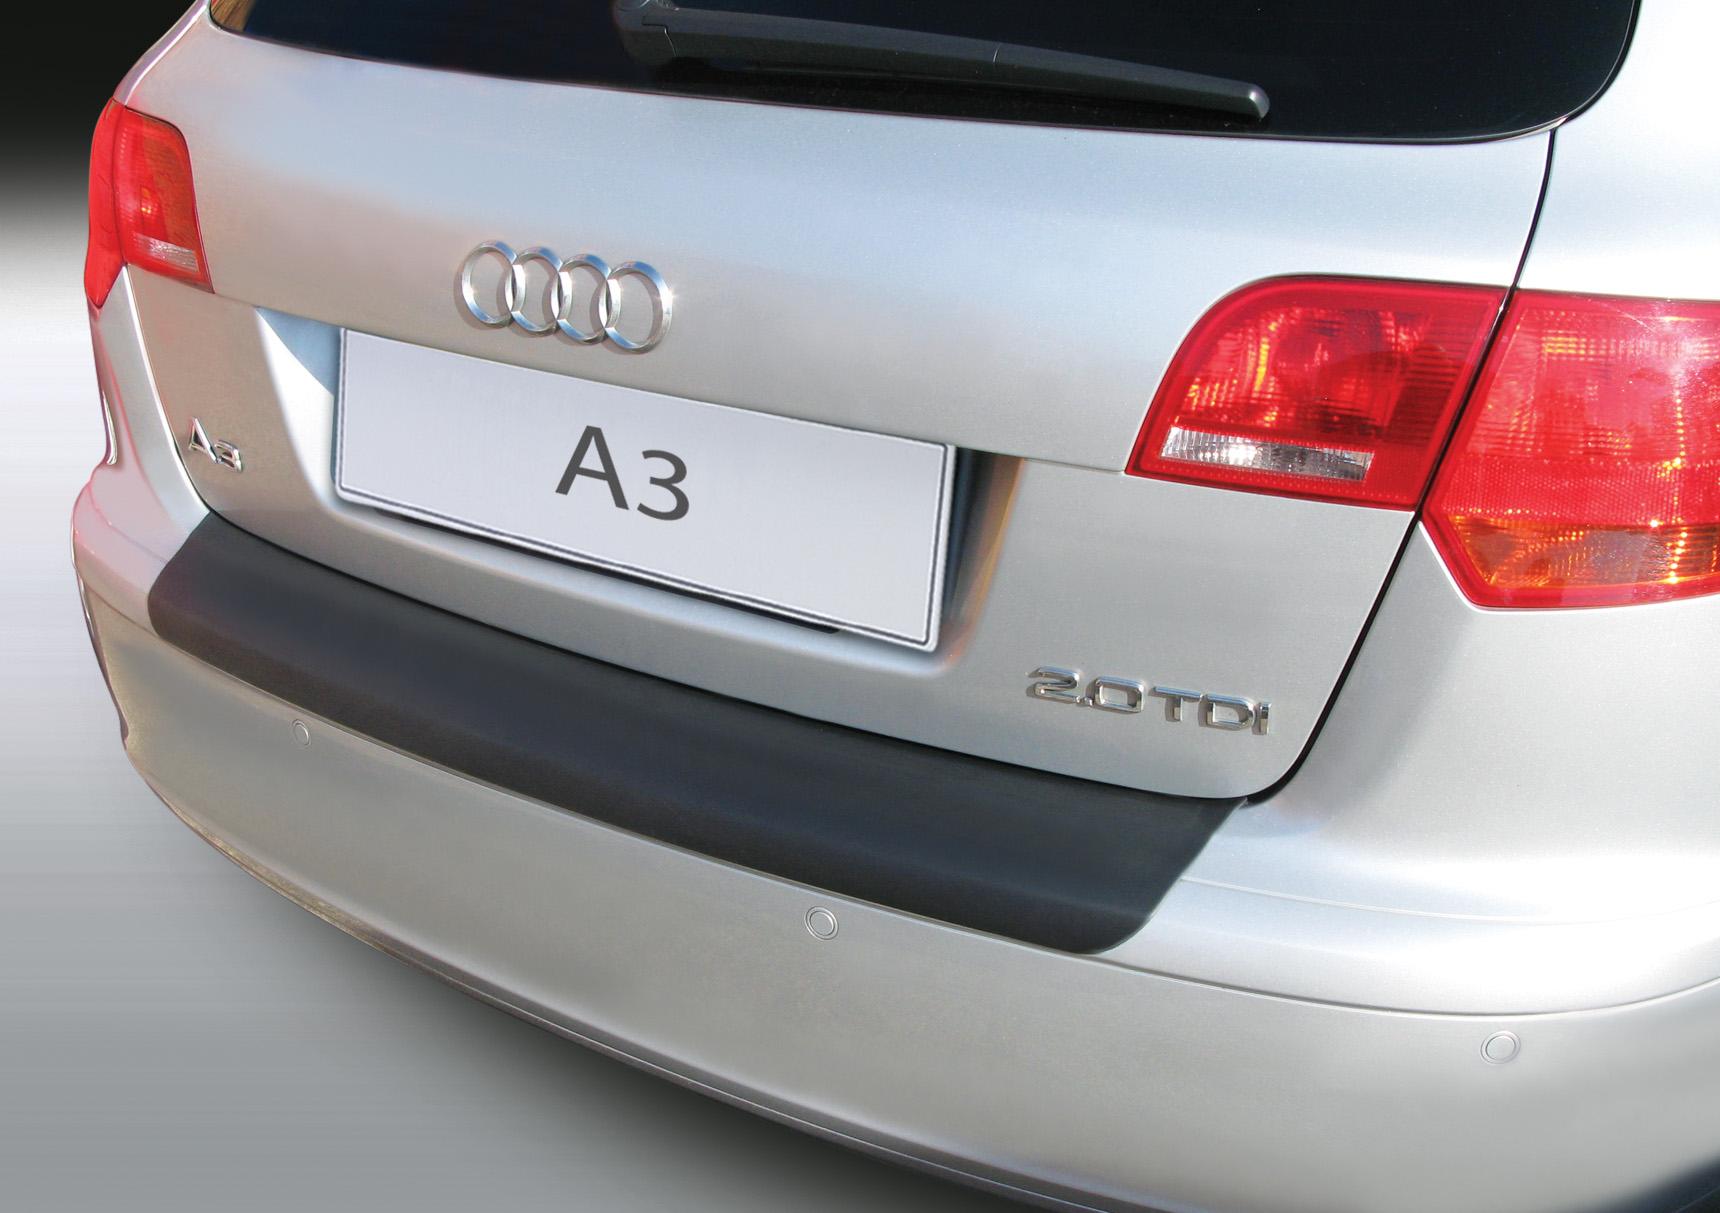 Накладка на задний бампер Audi A3, 5-дв. хэтчбек, 2004-2008